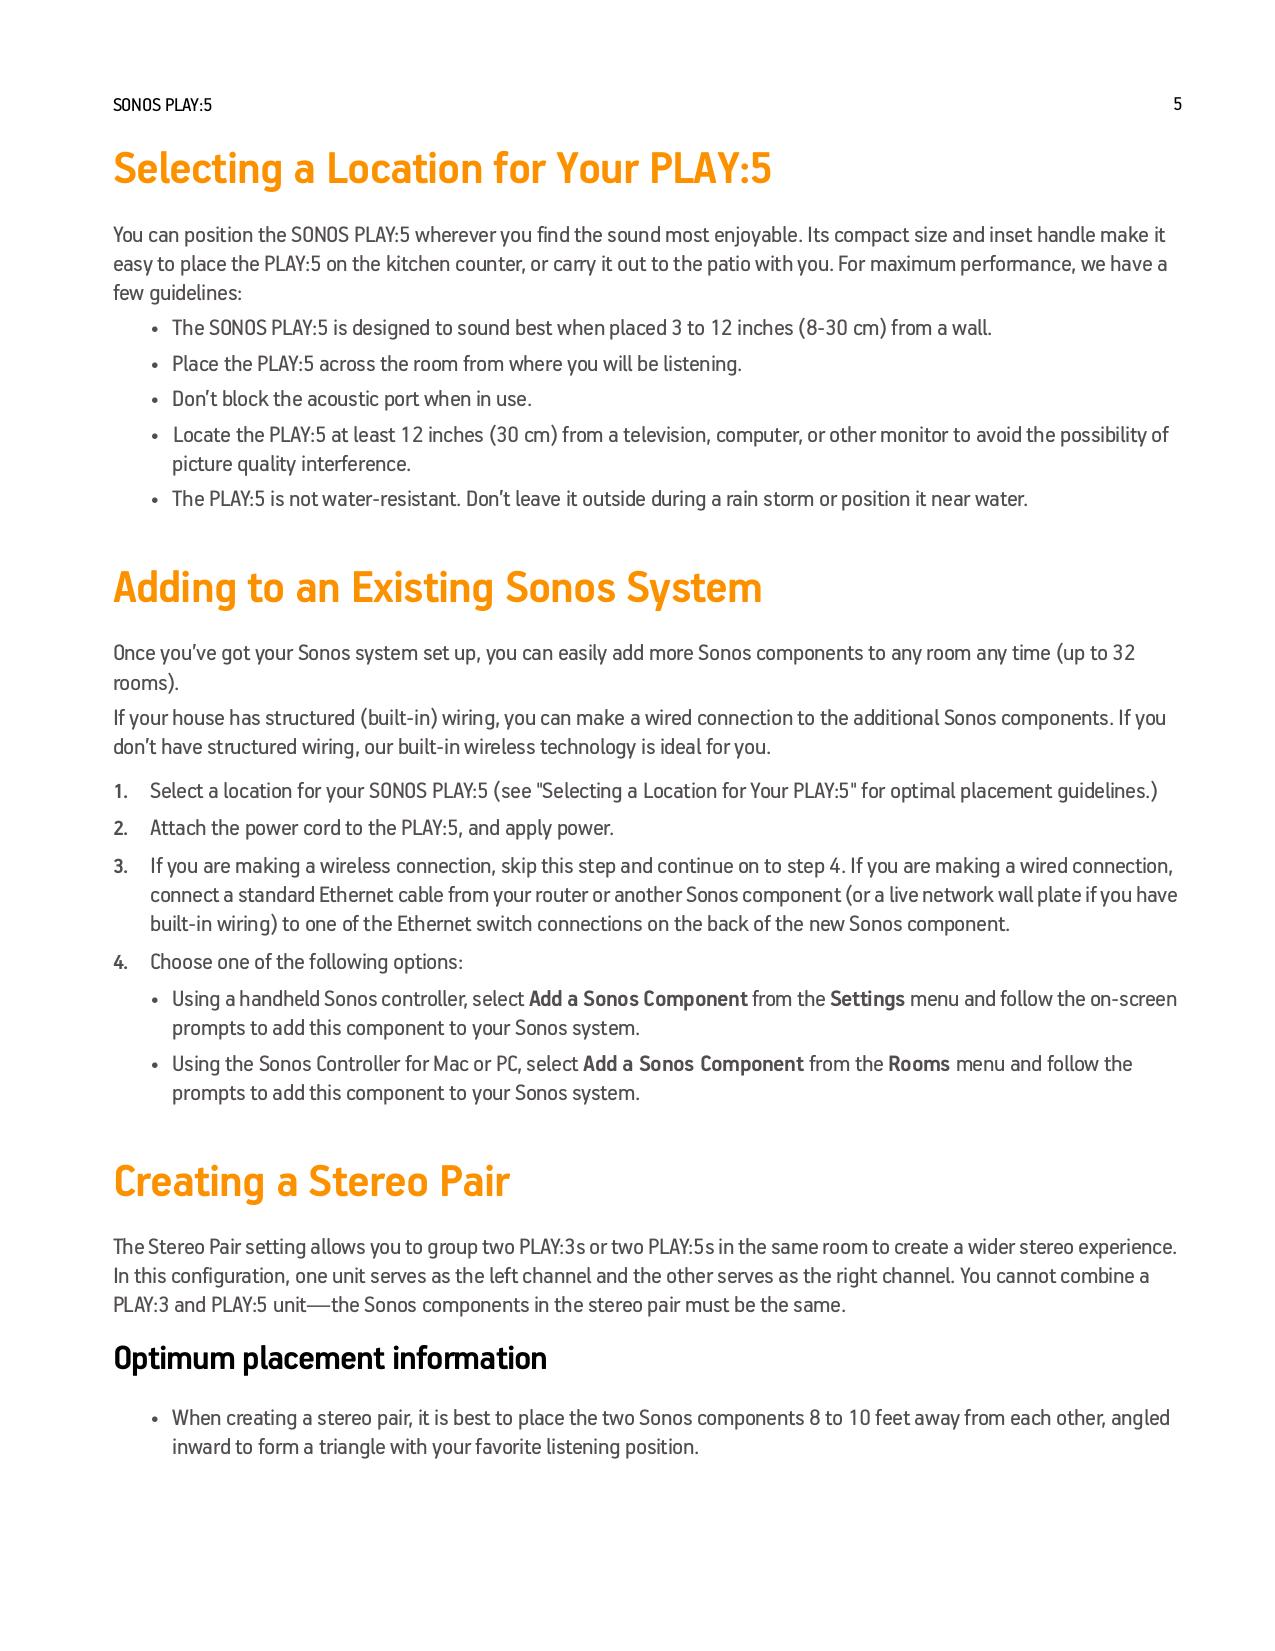 pdf manual for sonos other digital music system audio rh umlib com sonos play 5 manual gen 1 sonos play 5 user manual